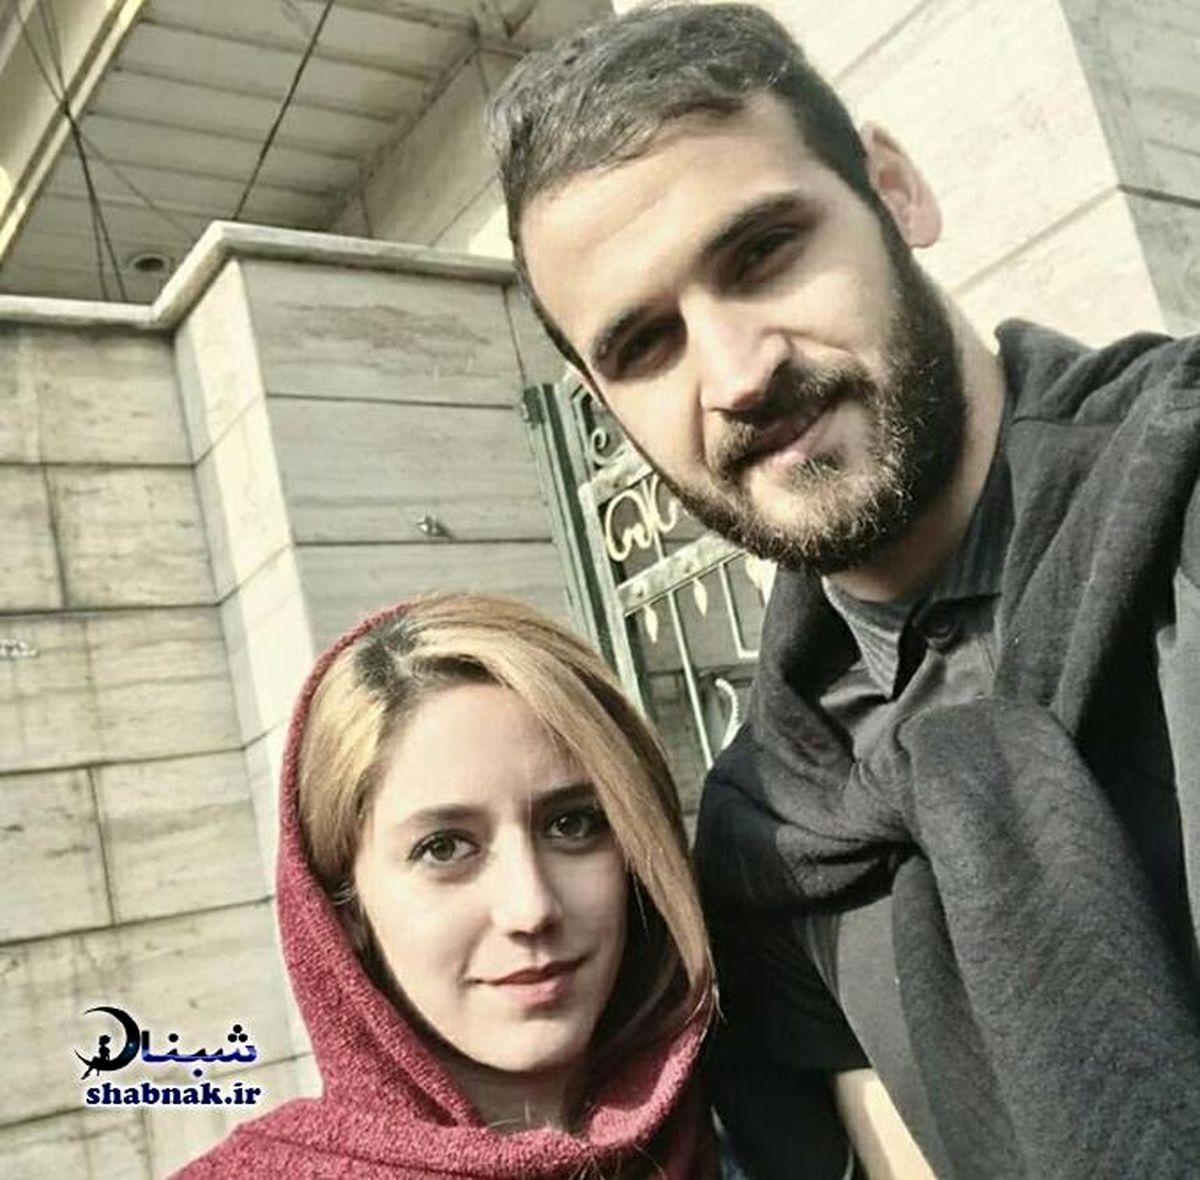 احمد نورالهی هافبک پرسپولیس کنار همسر مو بلوندش + عکس